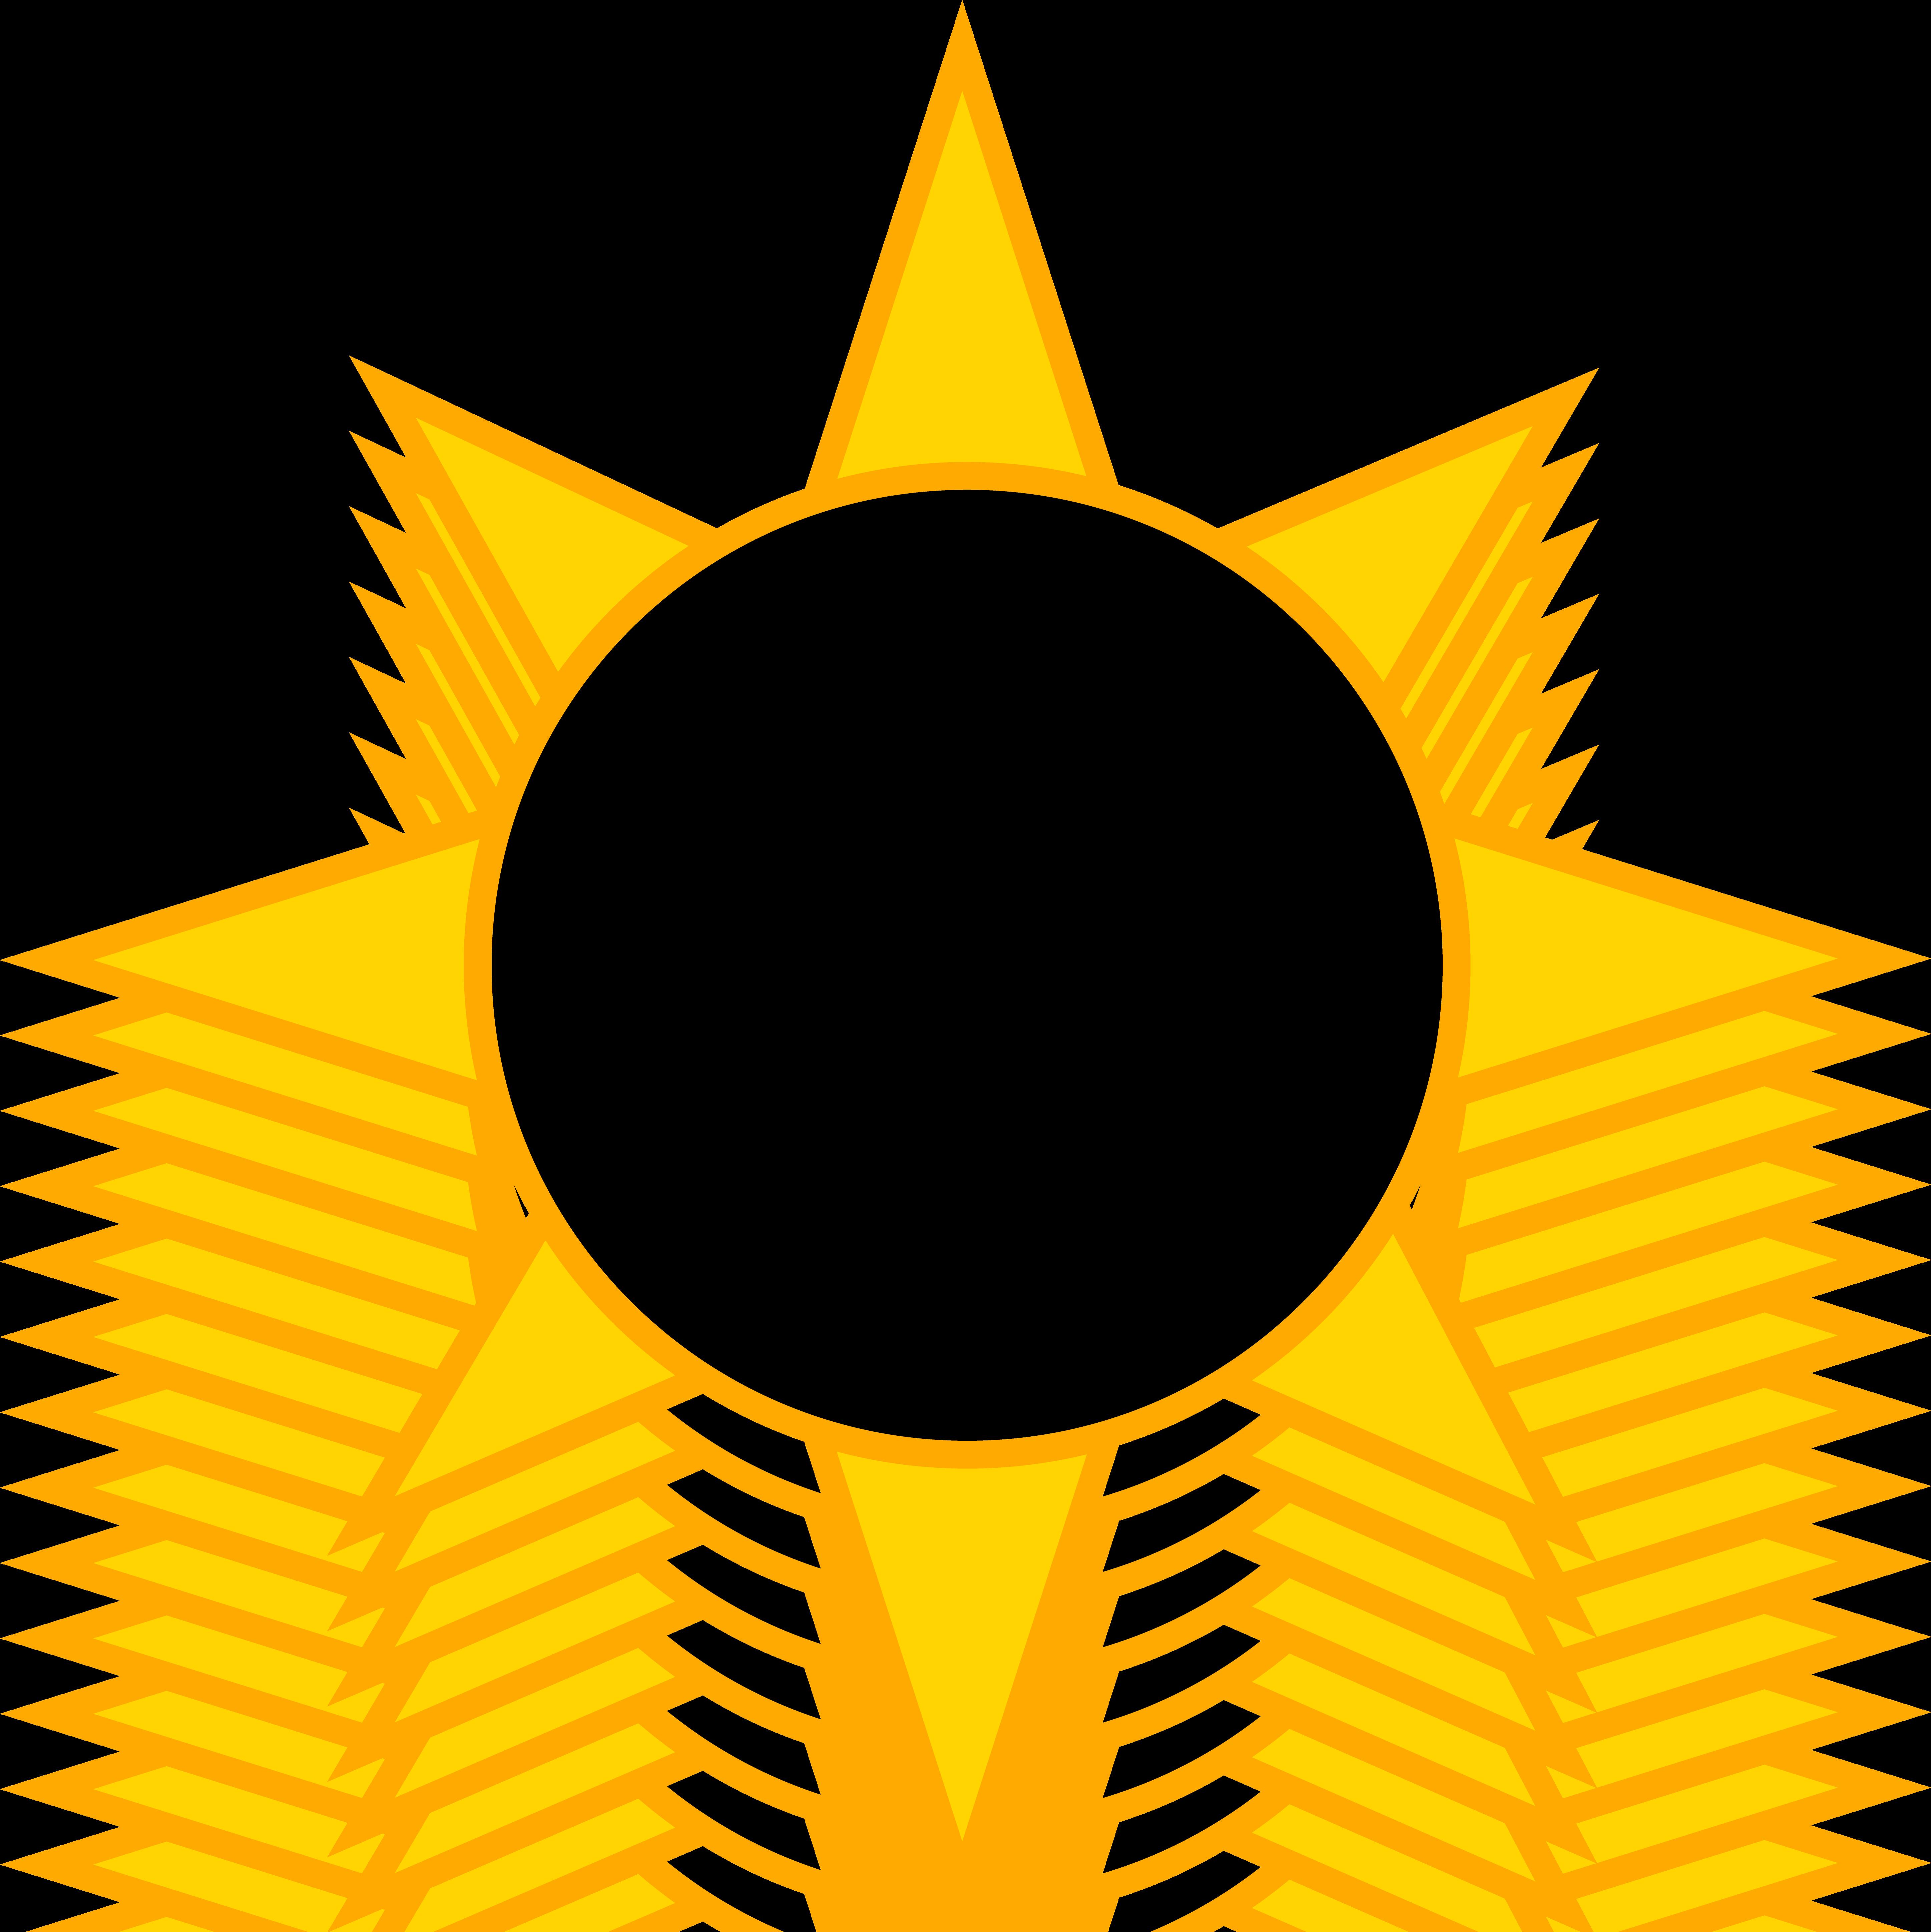 Eclipse clipart black and white, Eclipse black and white.